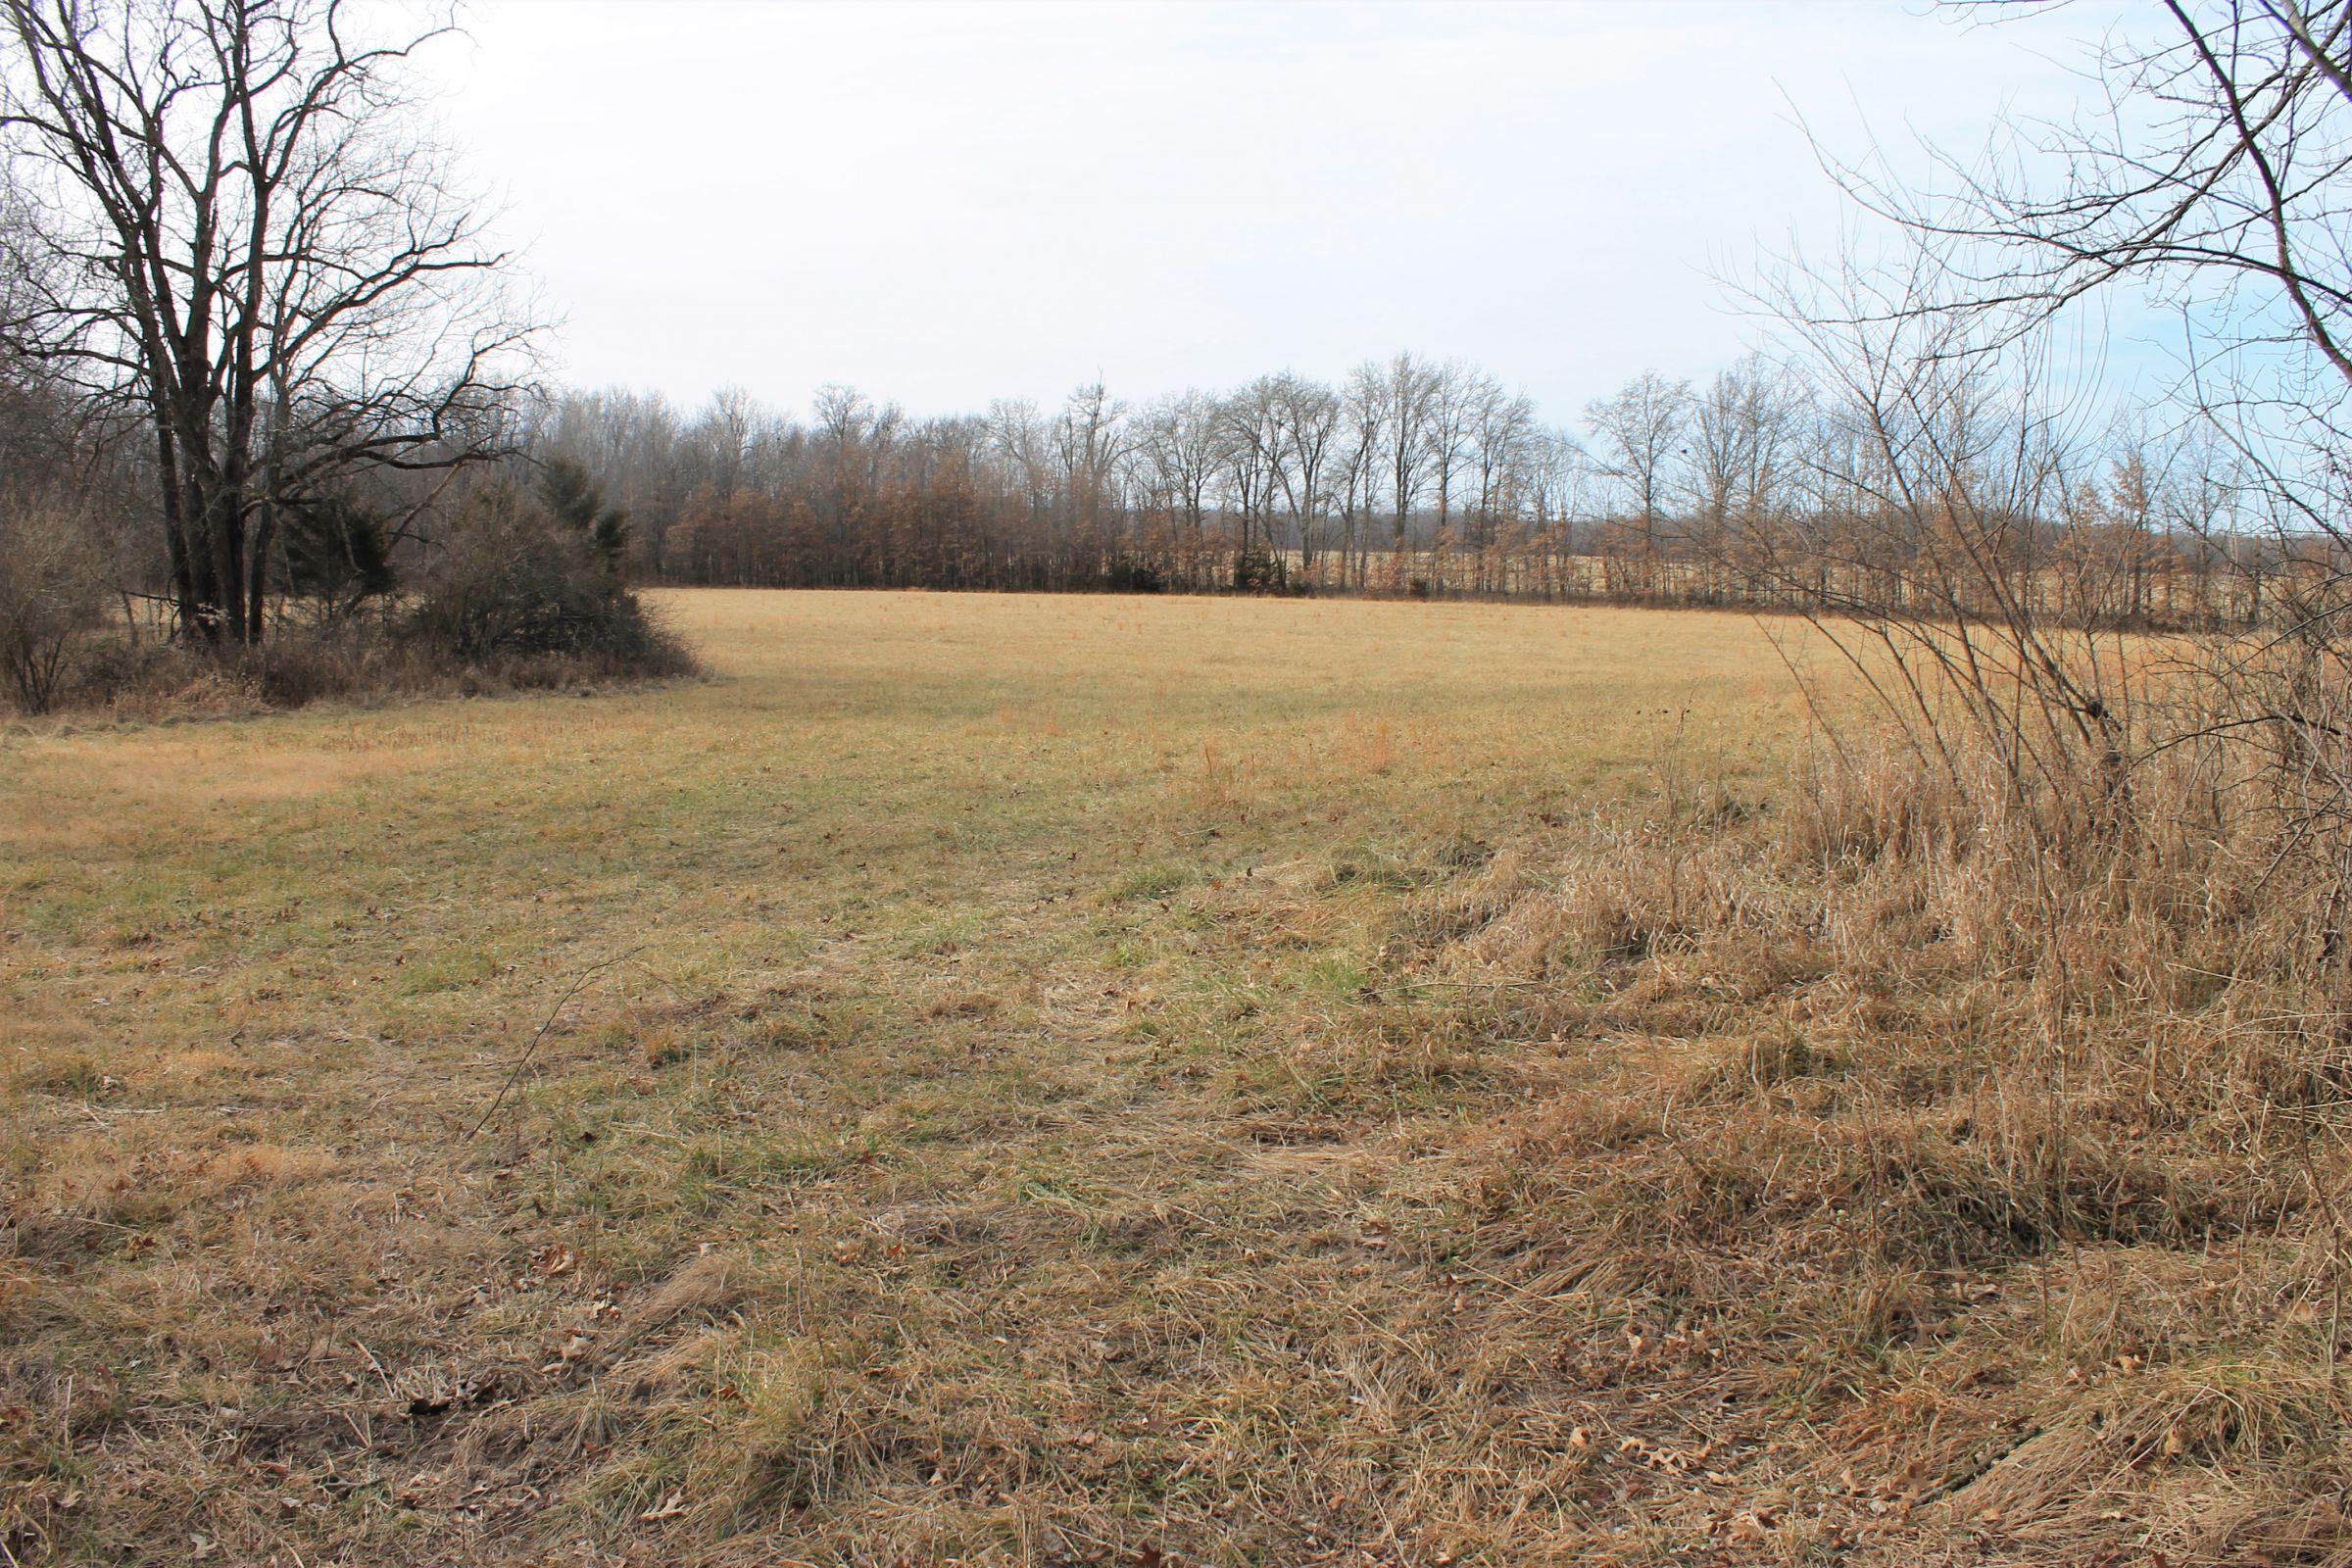 land-knox-county-missouri-239-acres-listing-number-15346-3-2021-02-05-144705.jpg